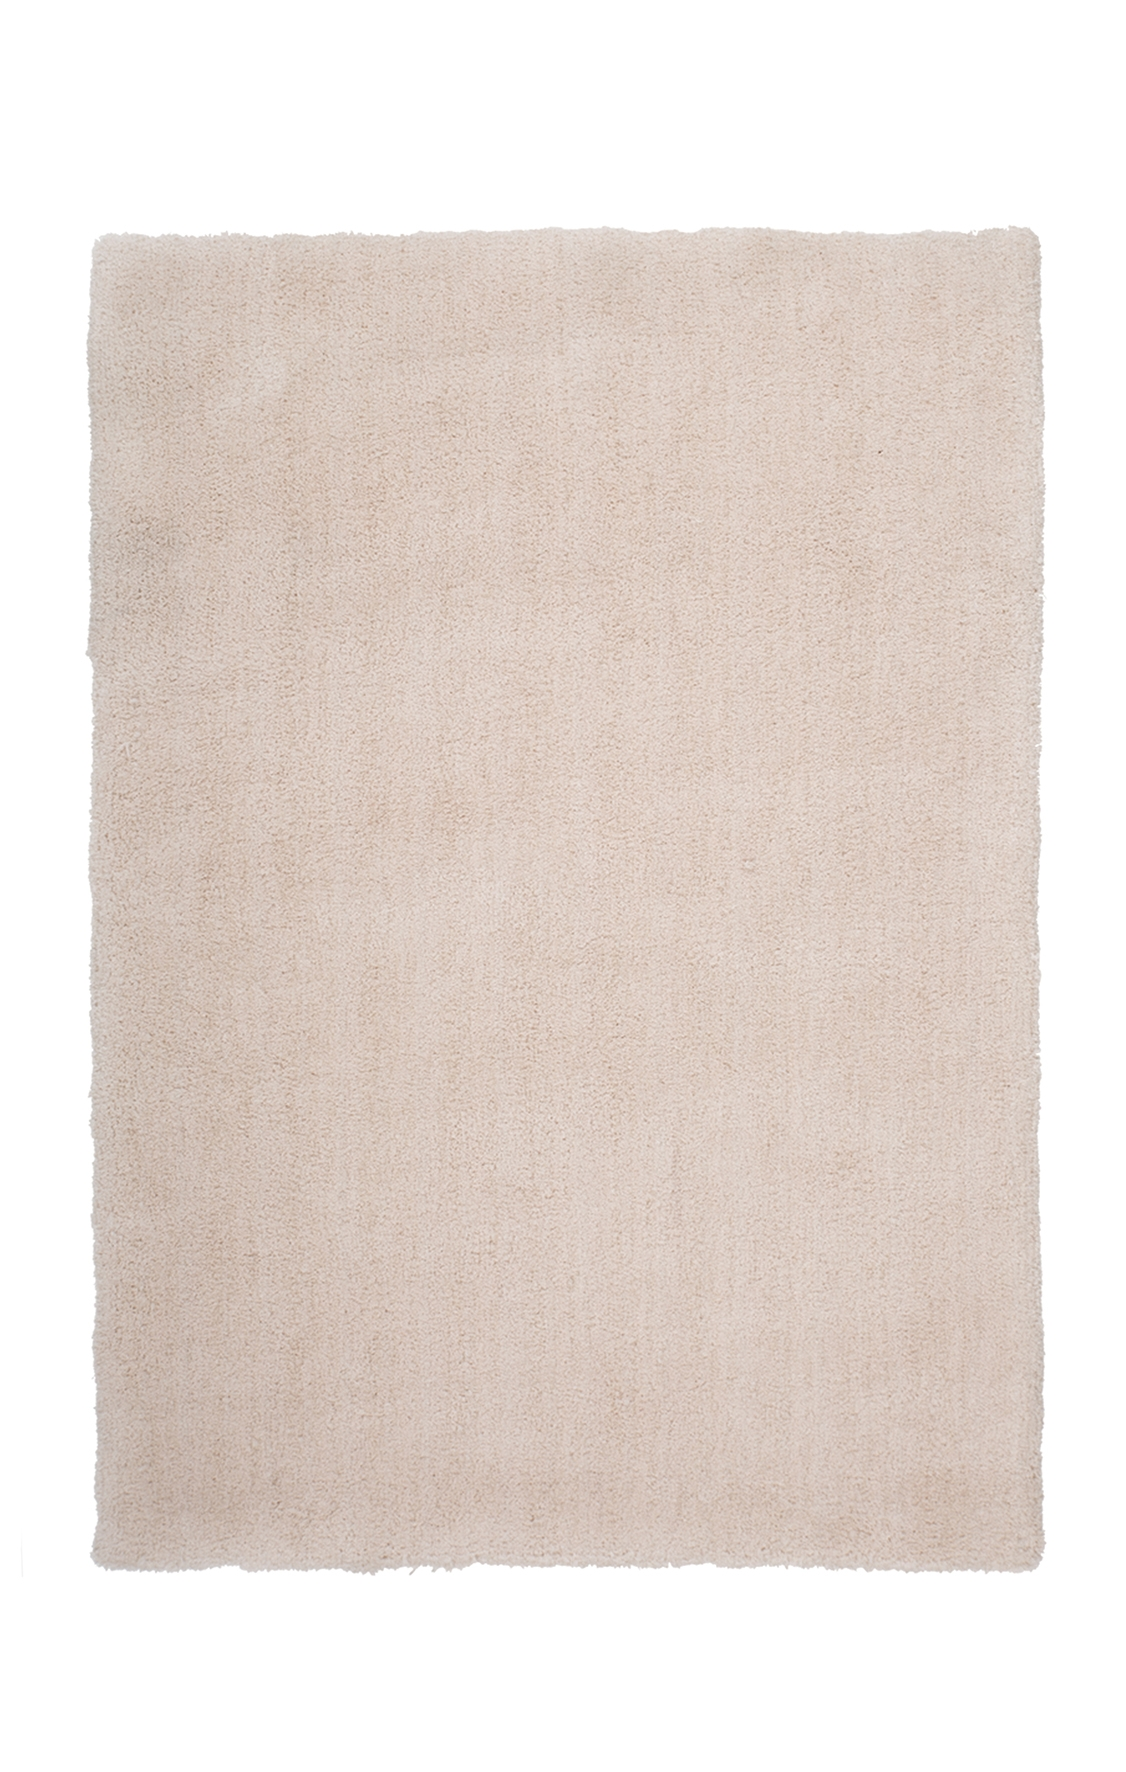 Obsession koberce Kusový koberec PARADISE 400 IVORY - 80x150 cm Expres